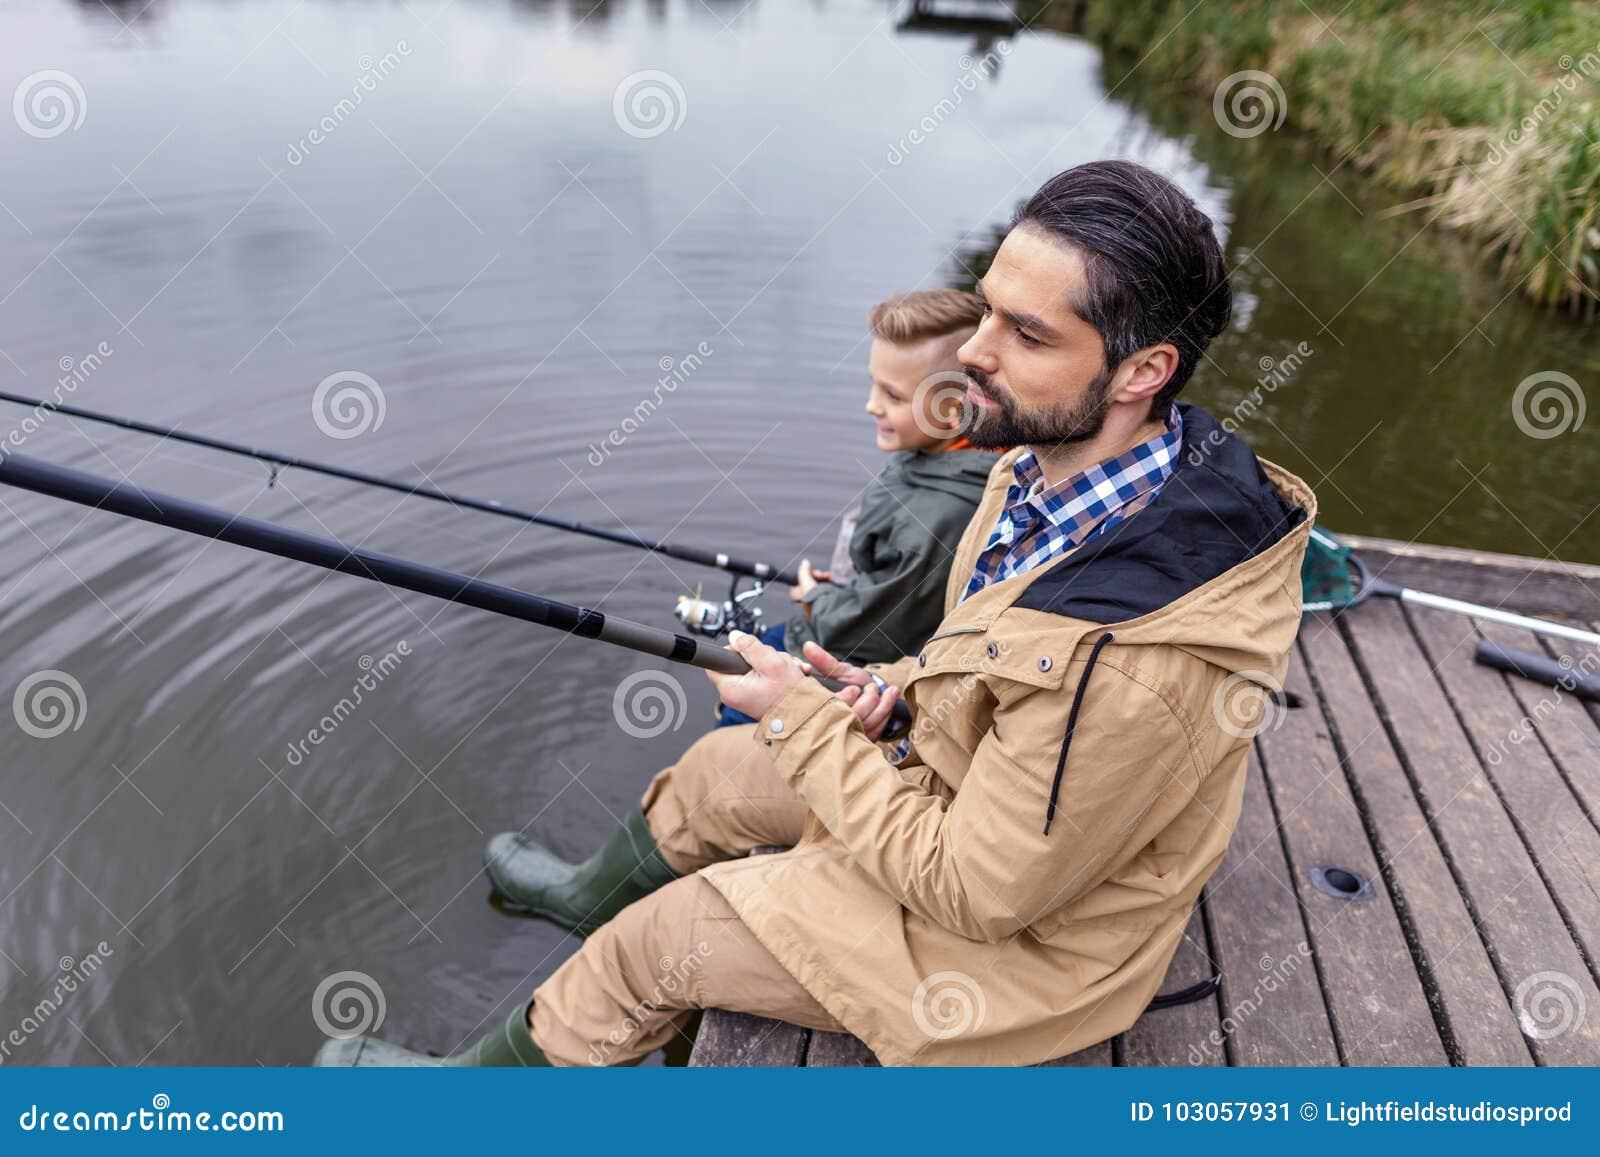 Daddy rod down